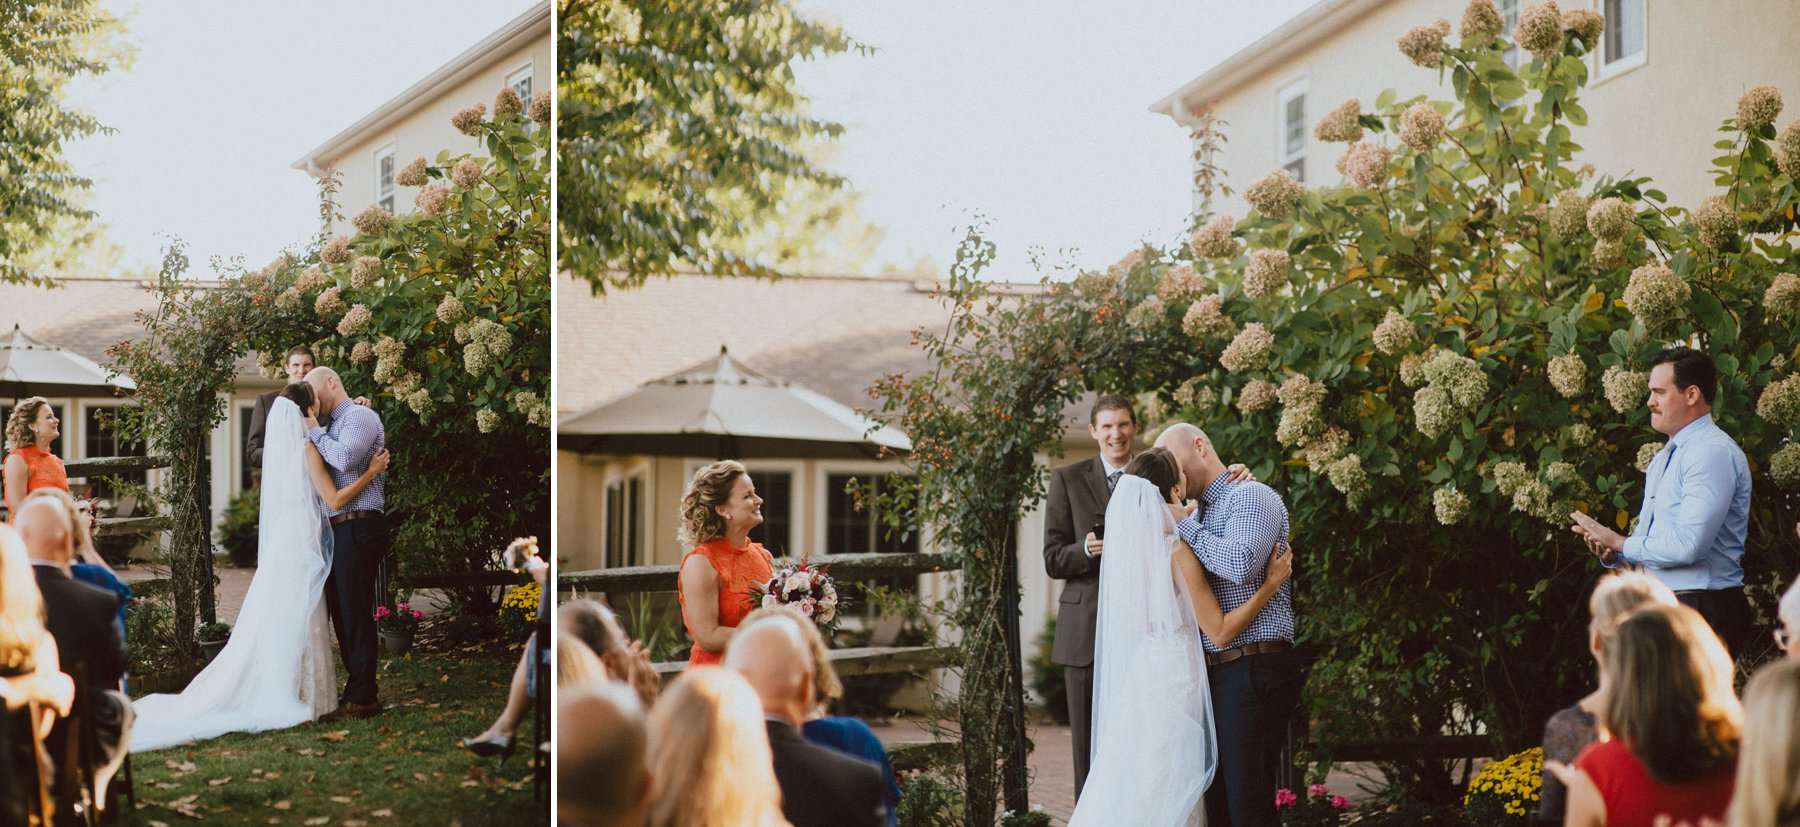 faunbrook-bed-and-breakfast-wedding-69.jpg